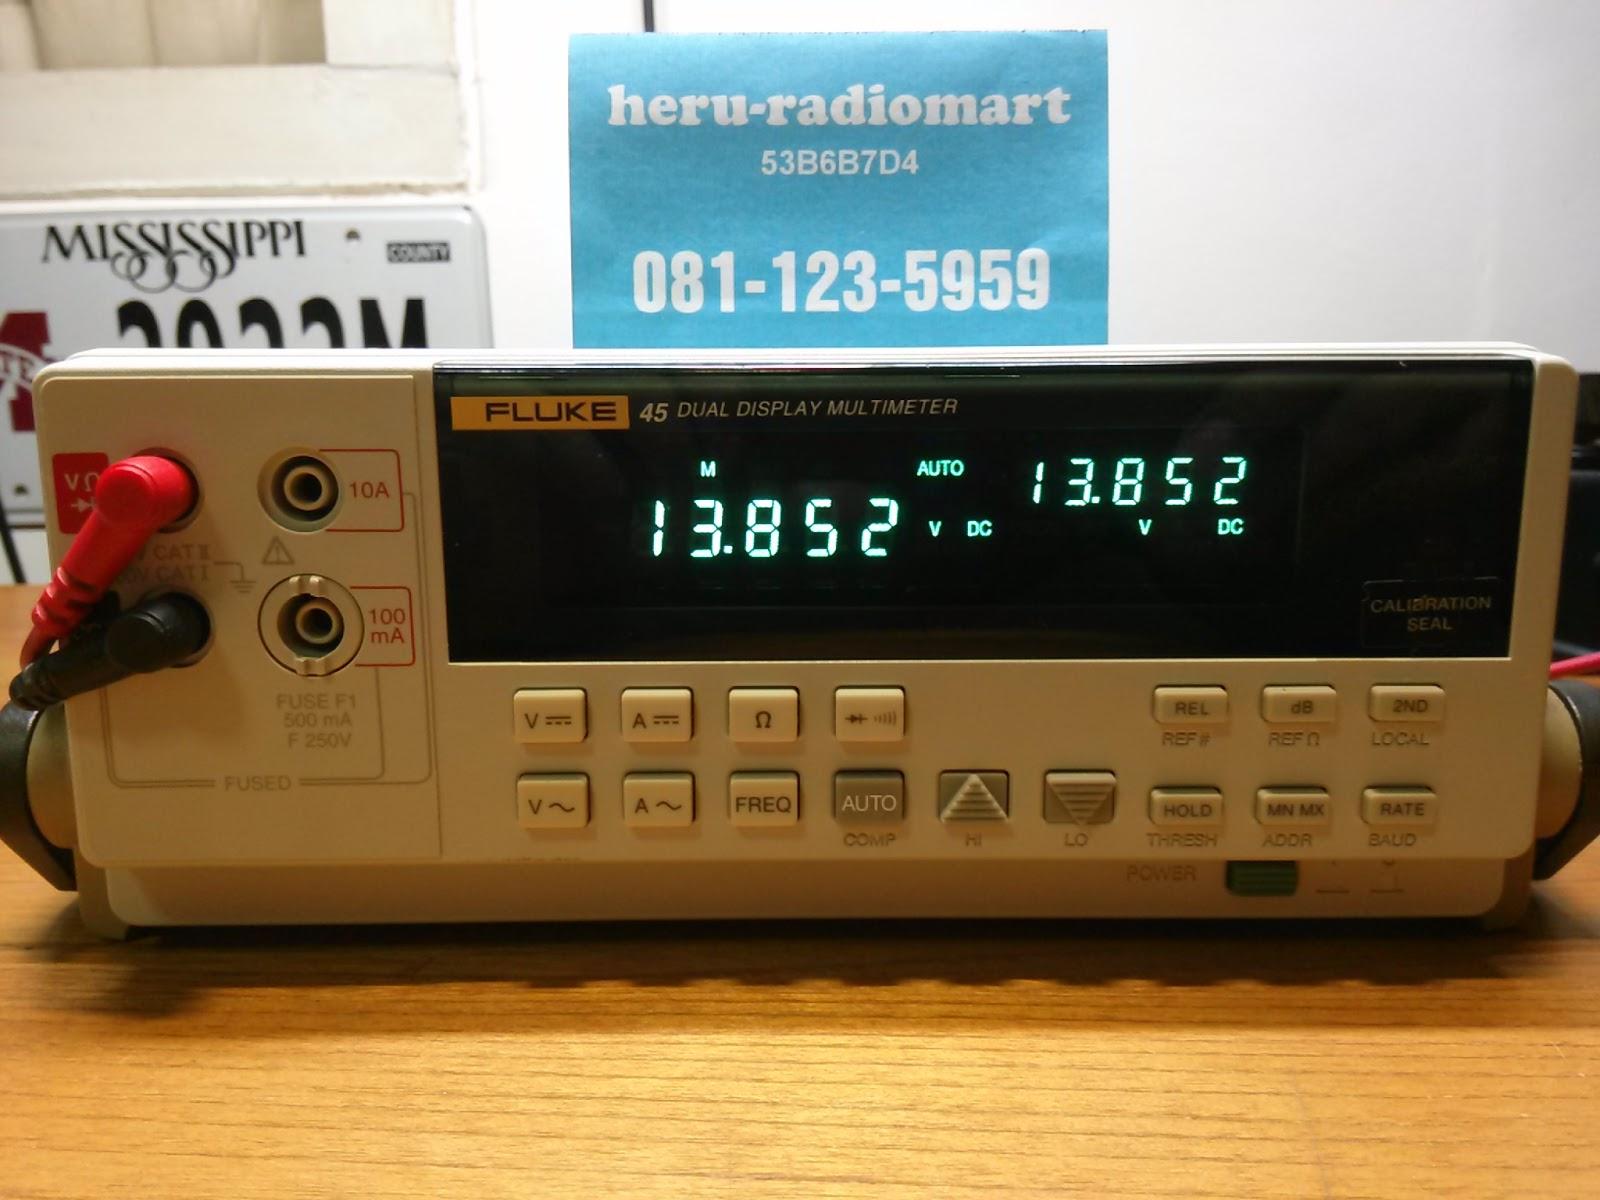 heru radiomart fluke 45 dual display digital multimeter s fluke 45 user manual pdf fluke 45 dual display multimeter user manual